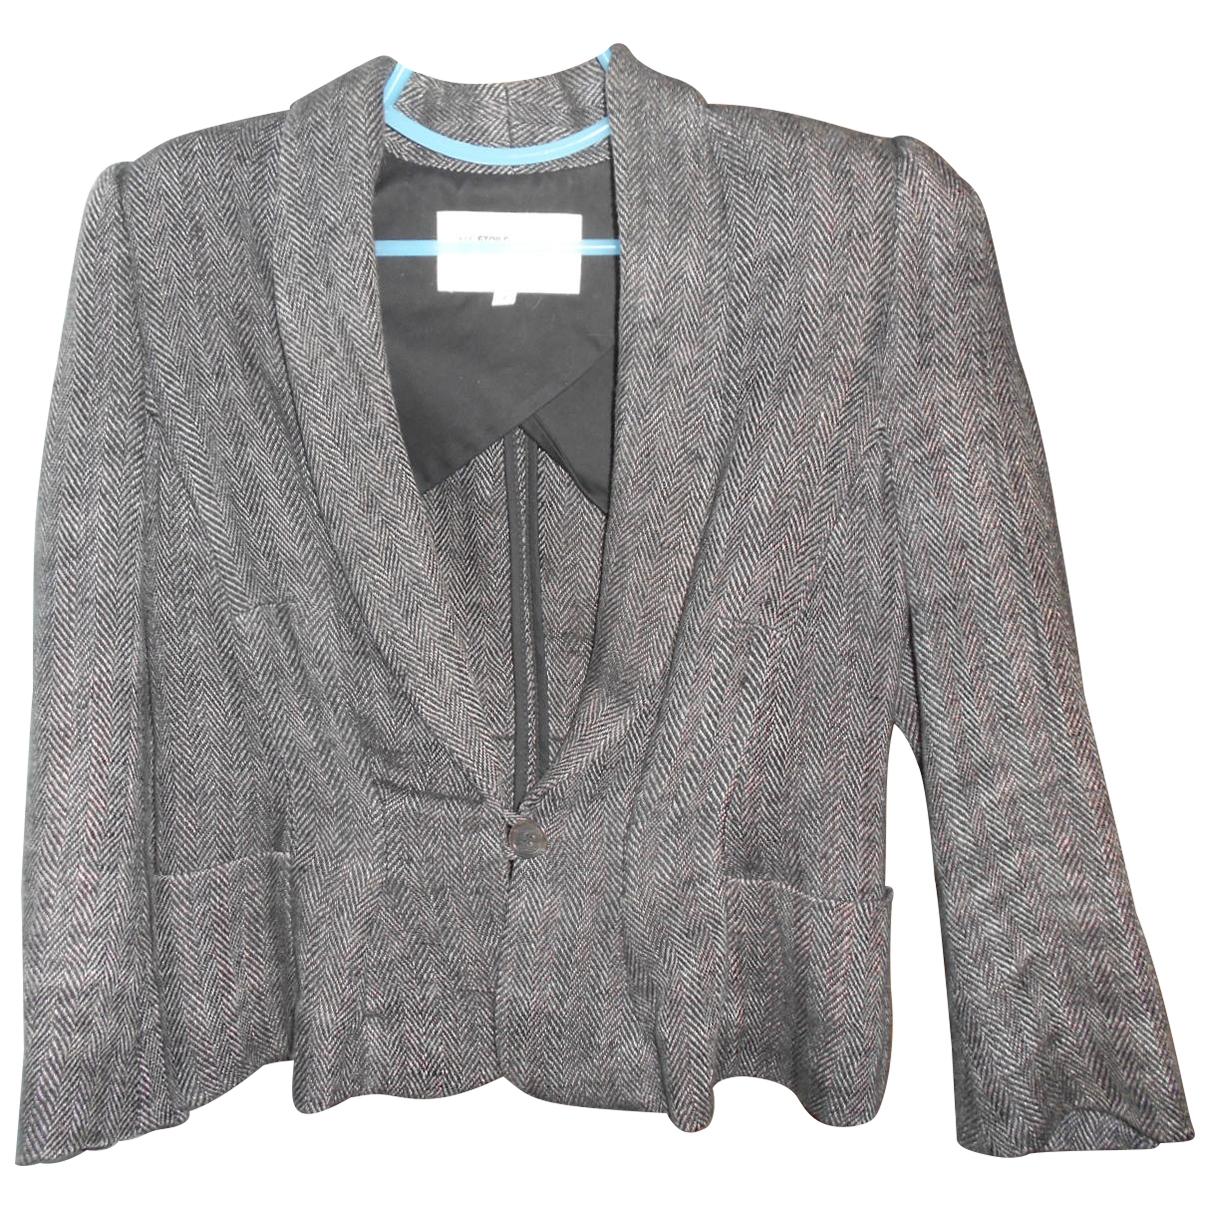 Isabel Marant Etoile \N Anthracite Linen jacket for Women 2 0-5